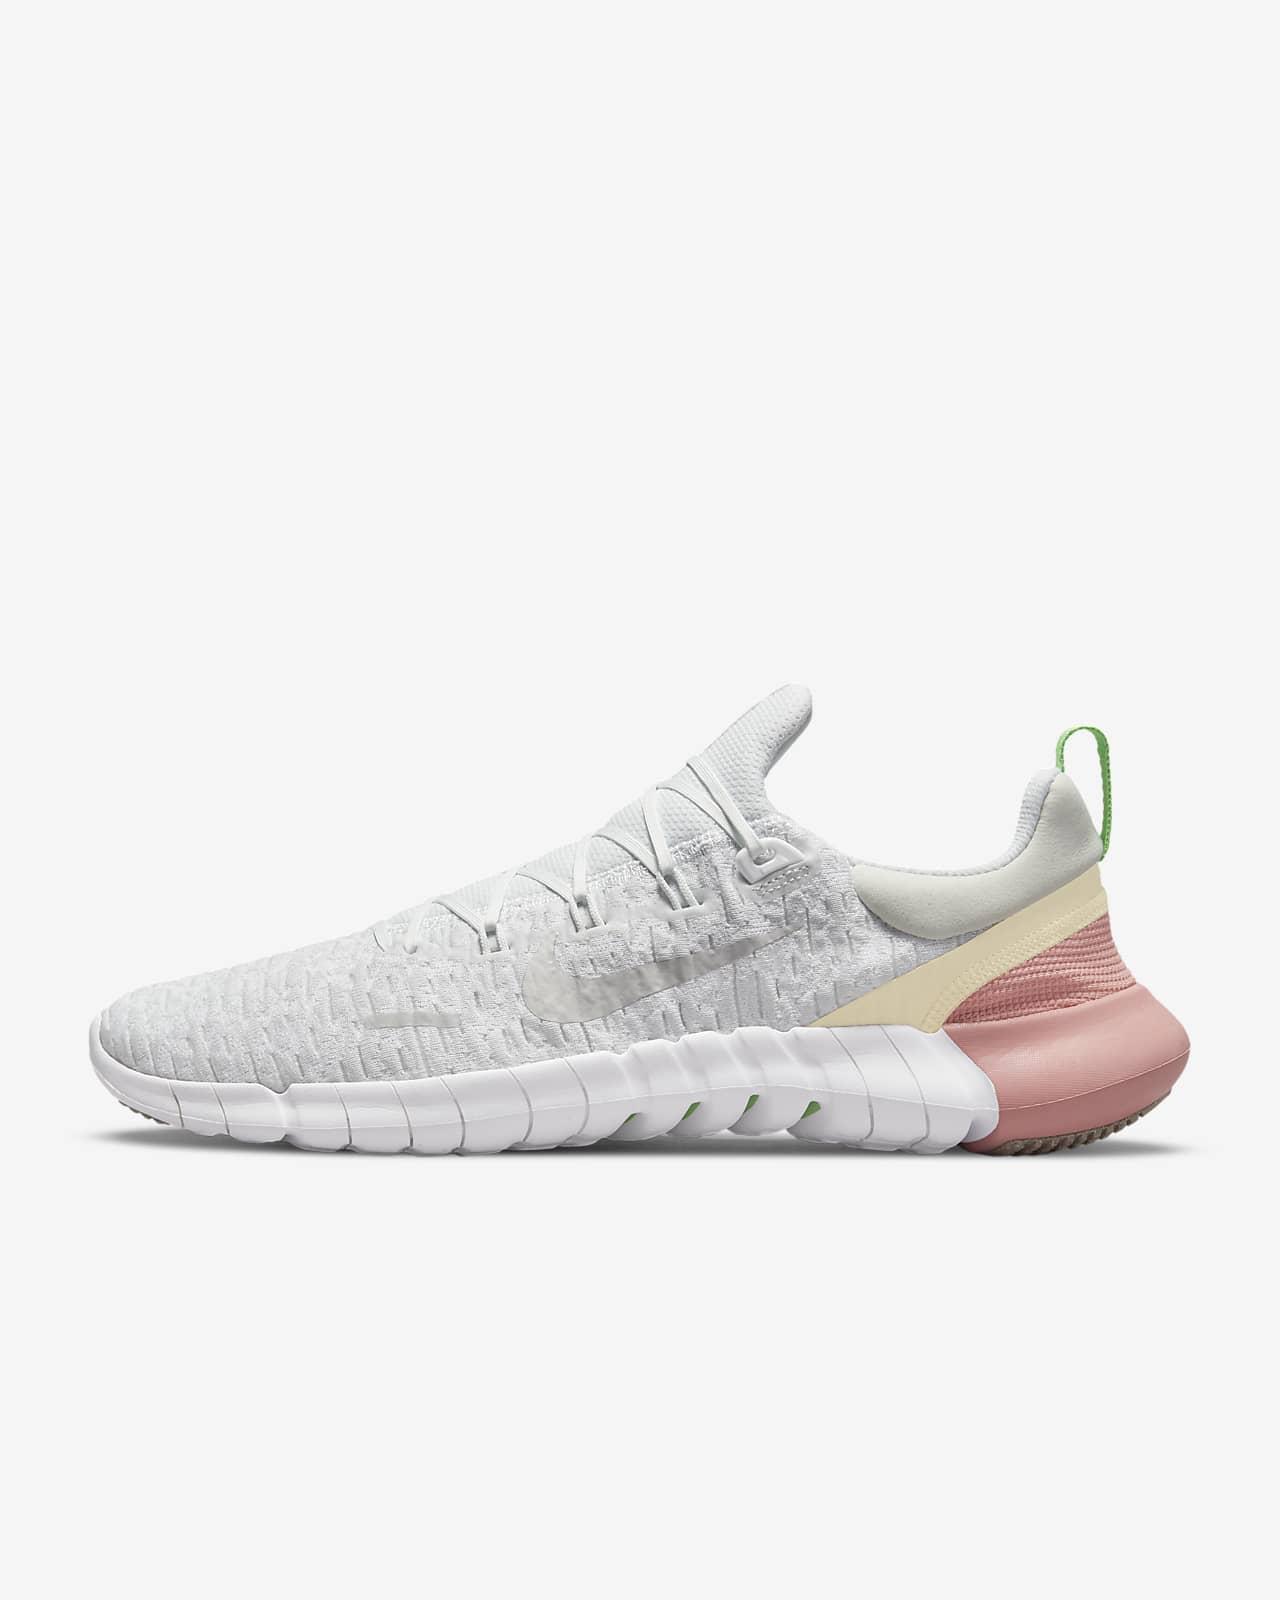 Nike Free Run 5.0 Men's Running Shoes